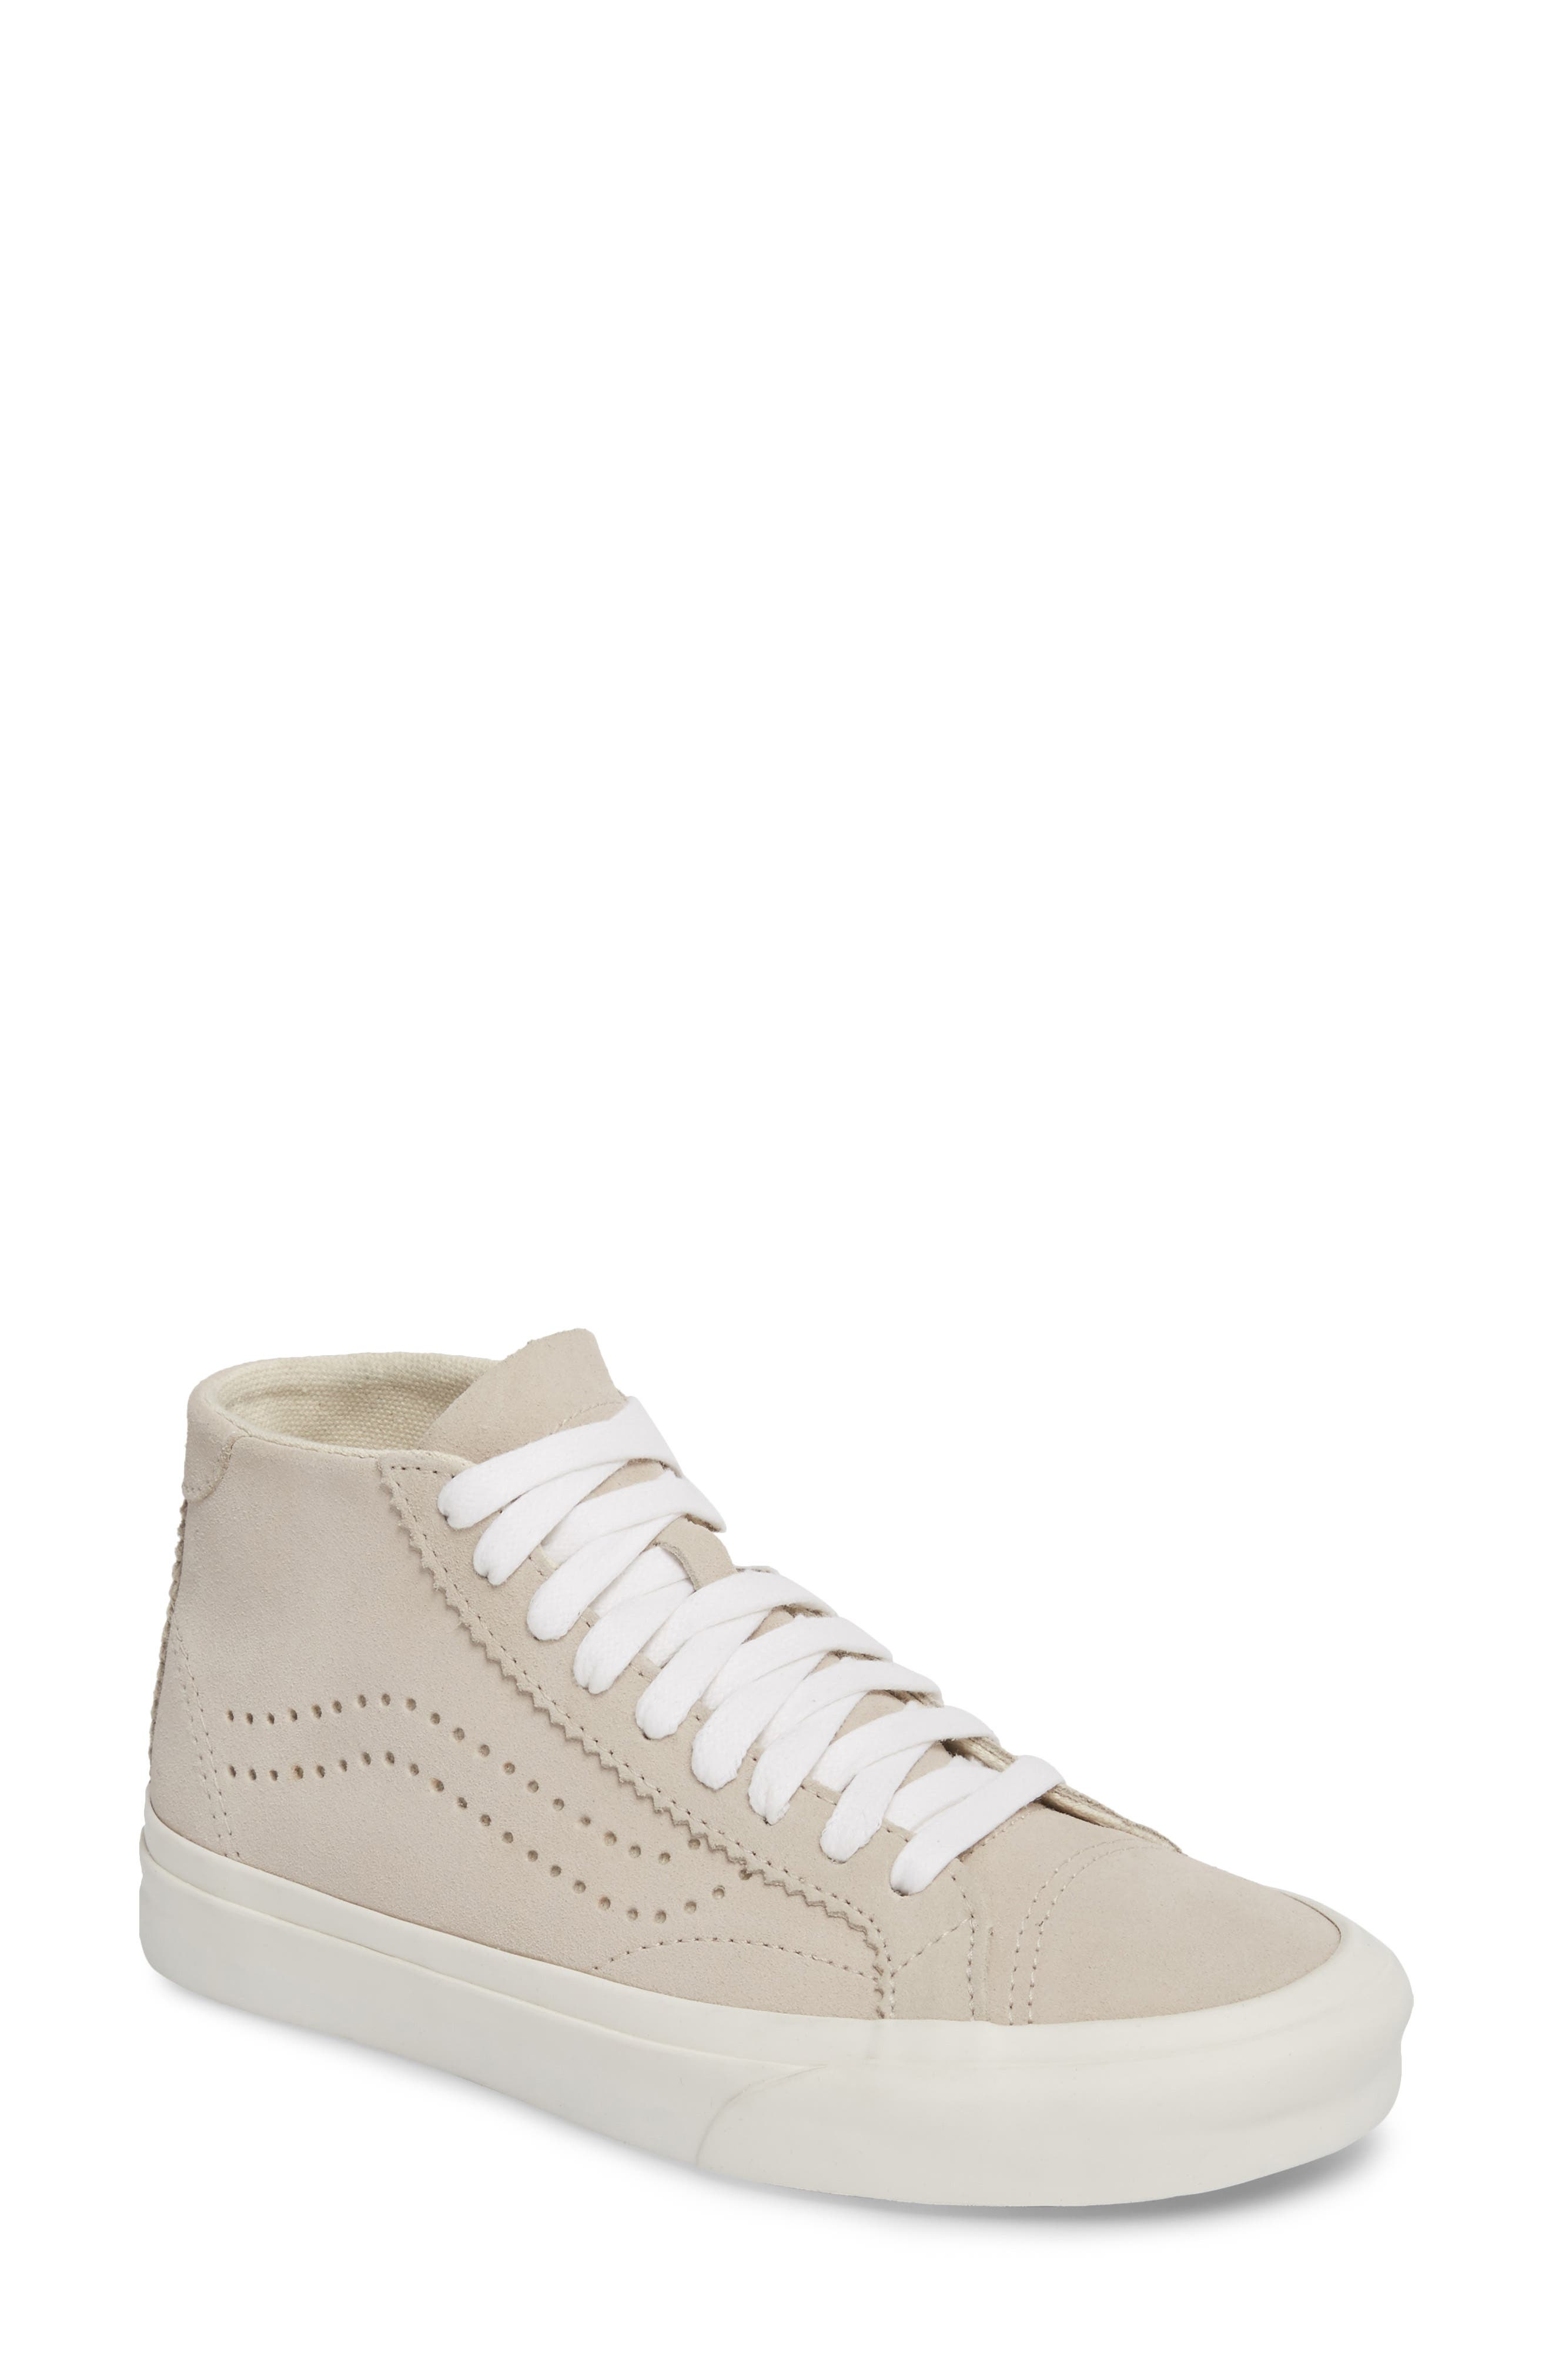 Court DX Mid Sneaker,                             Main thumbnail 1, color,                             040